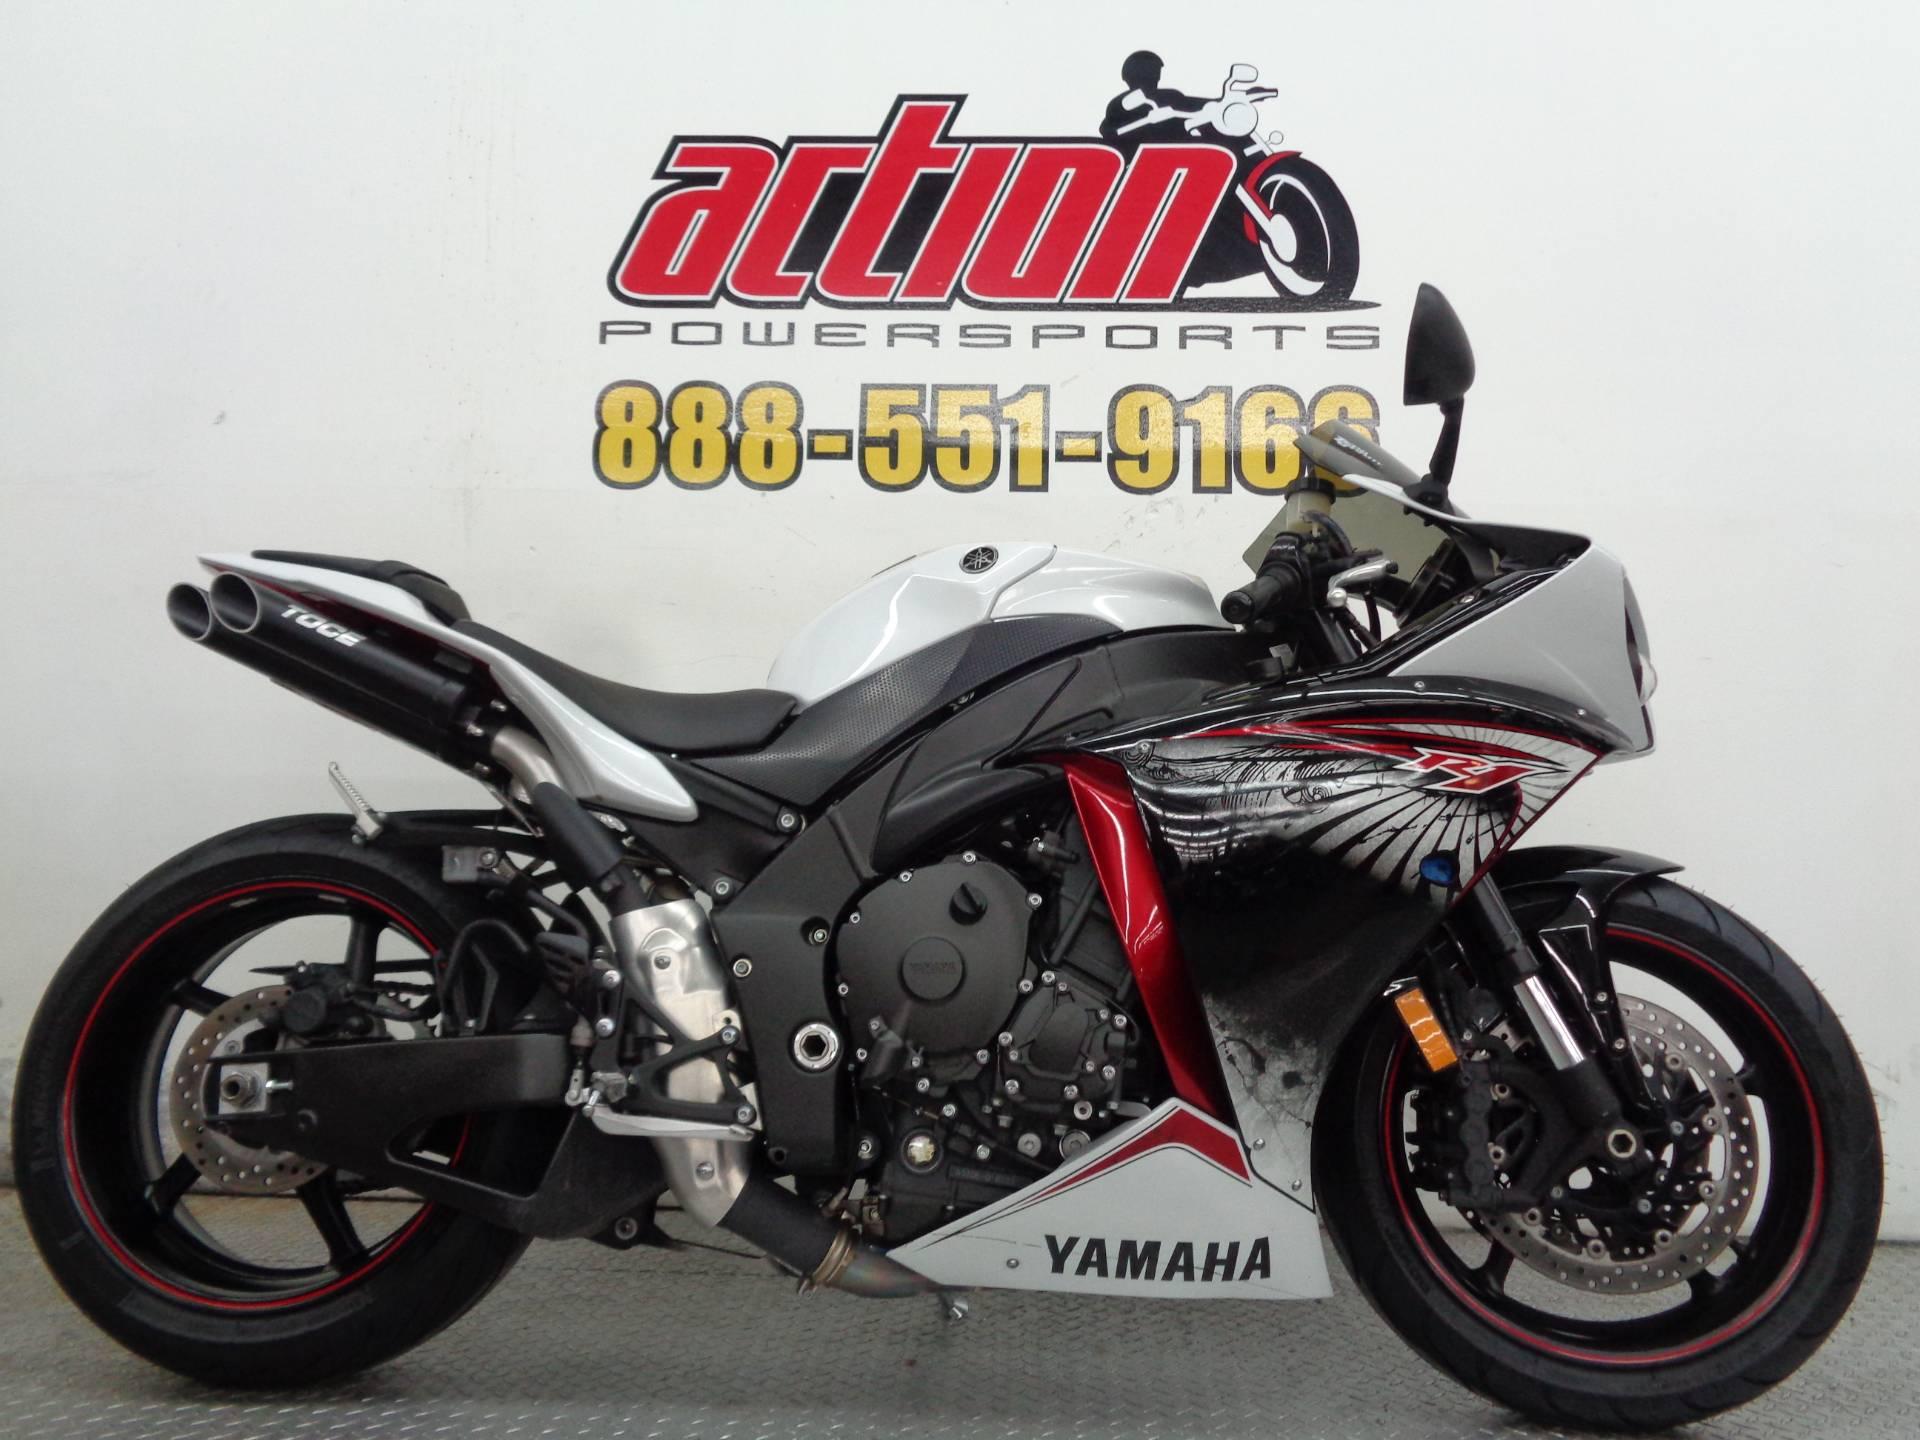 2012 Yamaha YZF-R1 for sale 26628